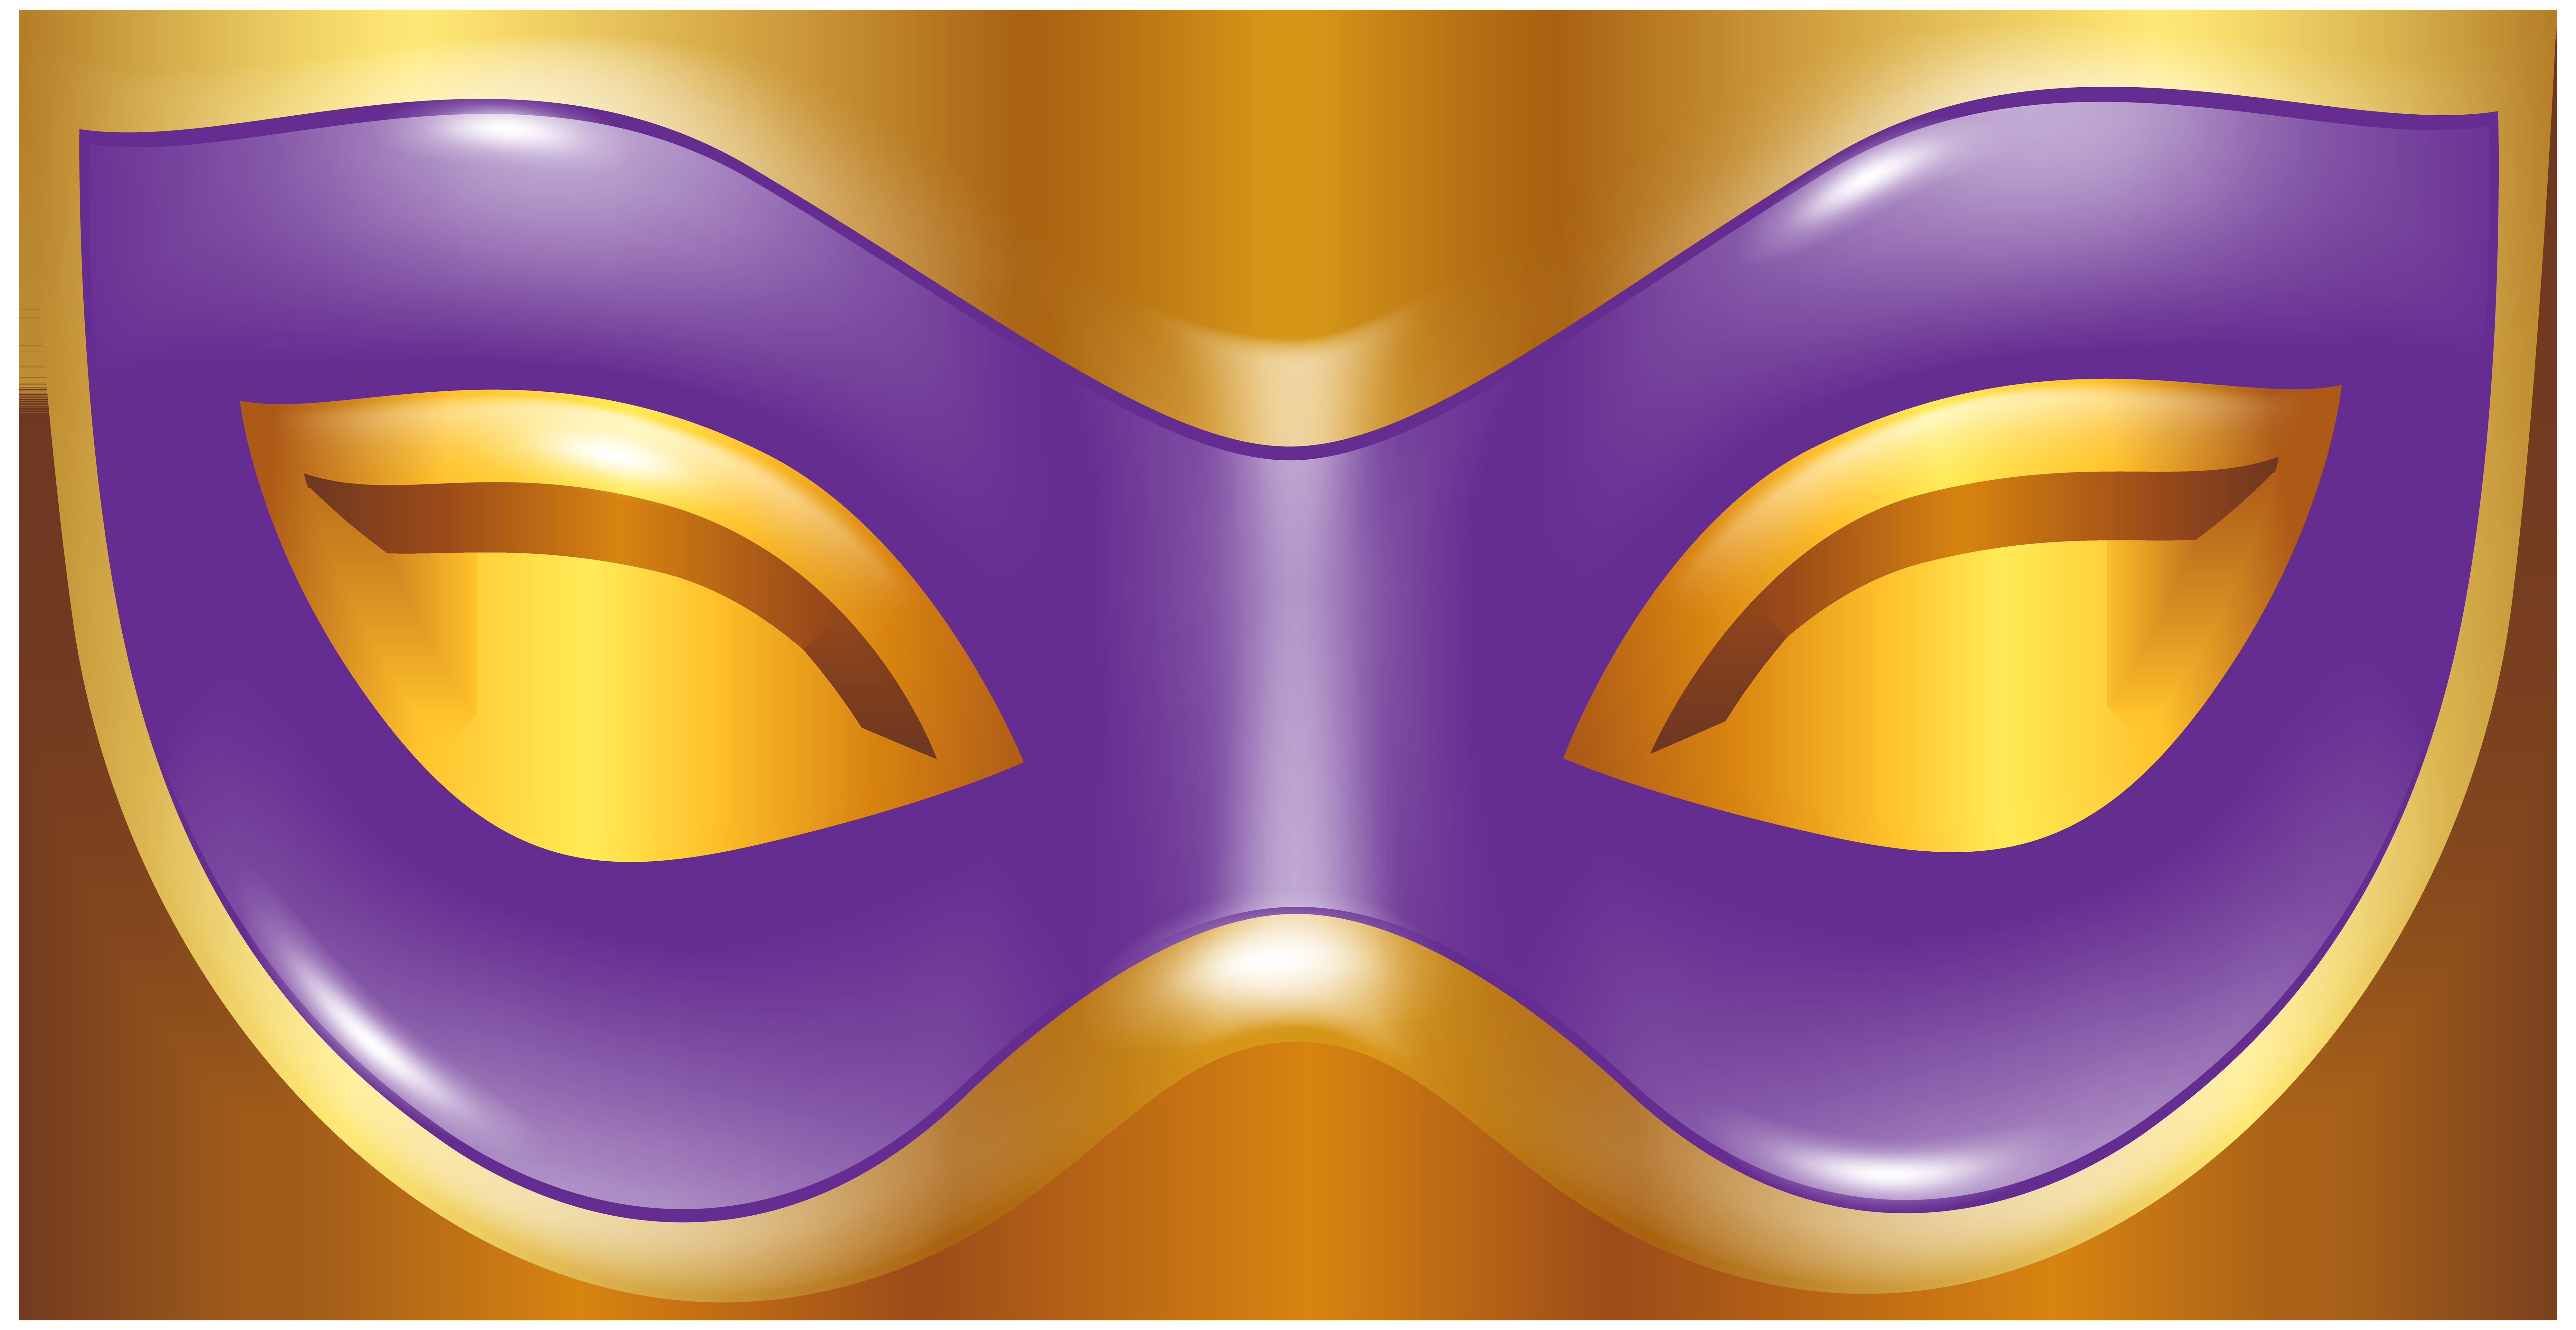 mardi gras mask clipart at getdrawings com free for personal use rh getdrawings com  mardi gras mask clip art images